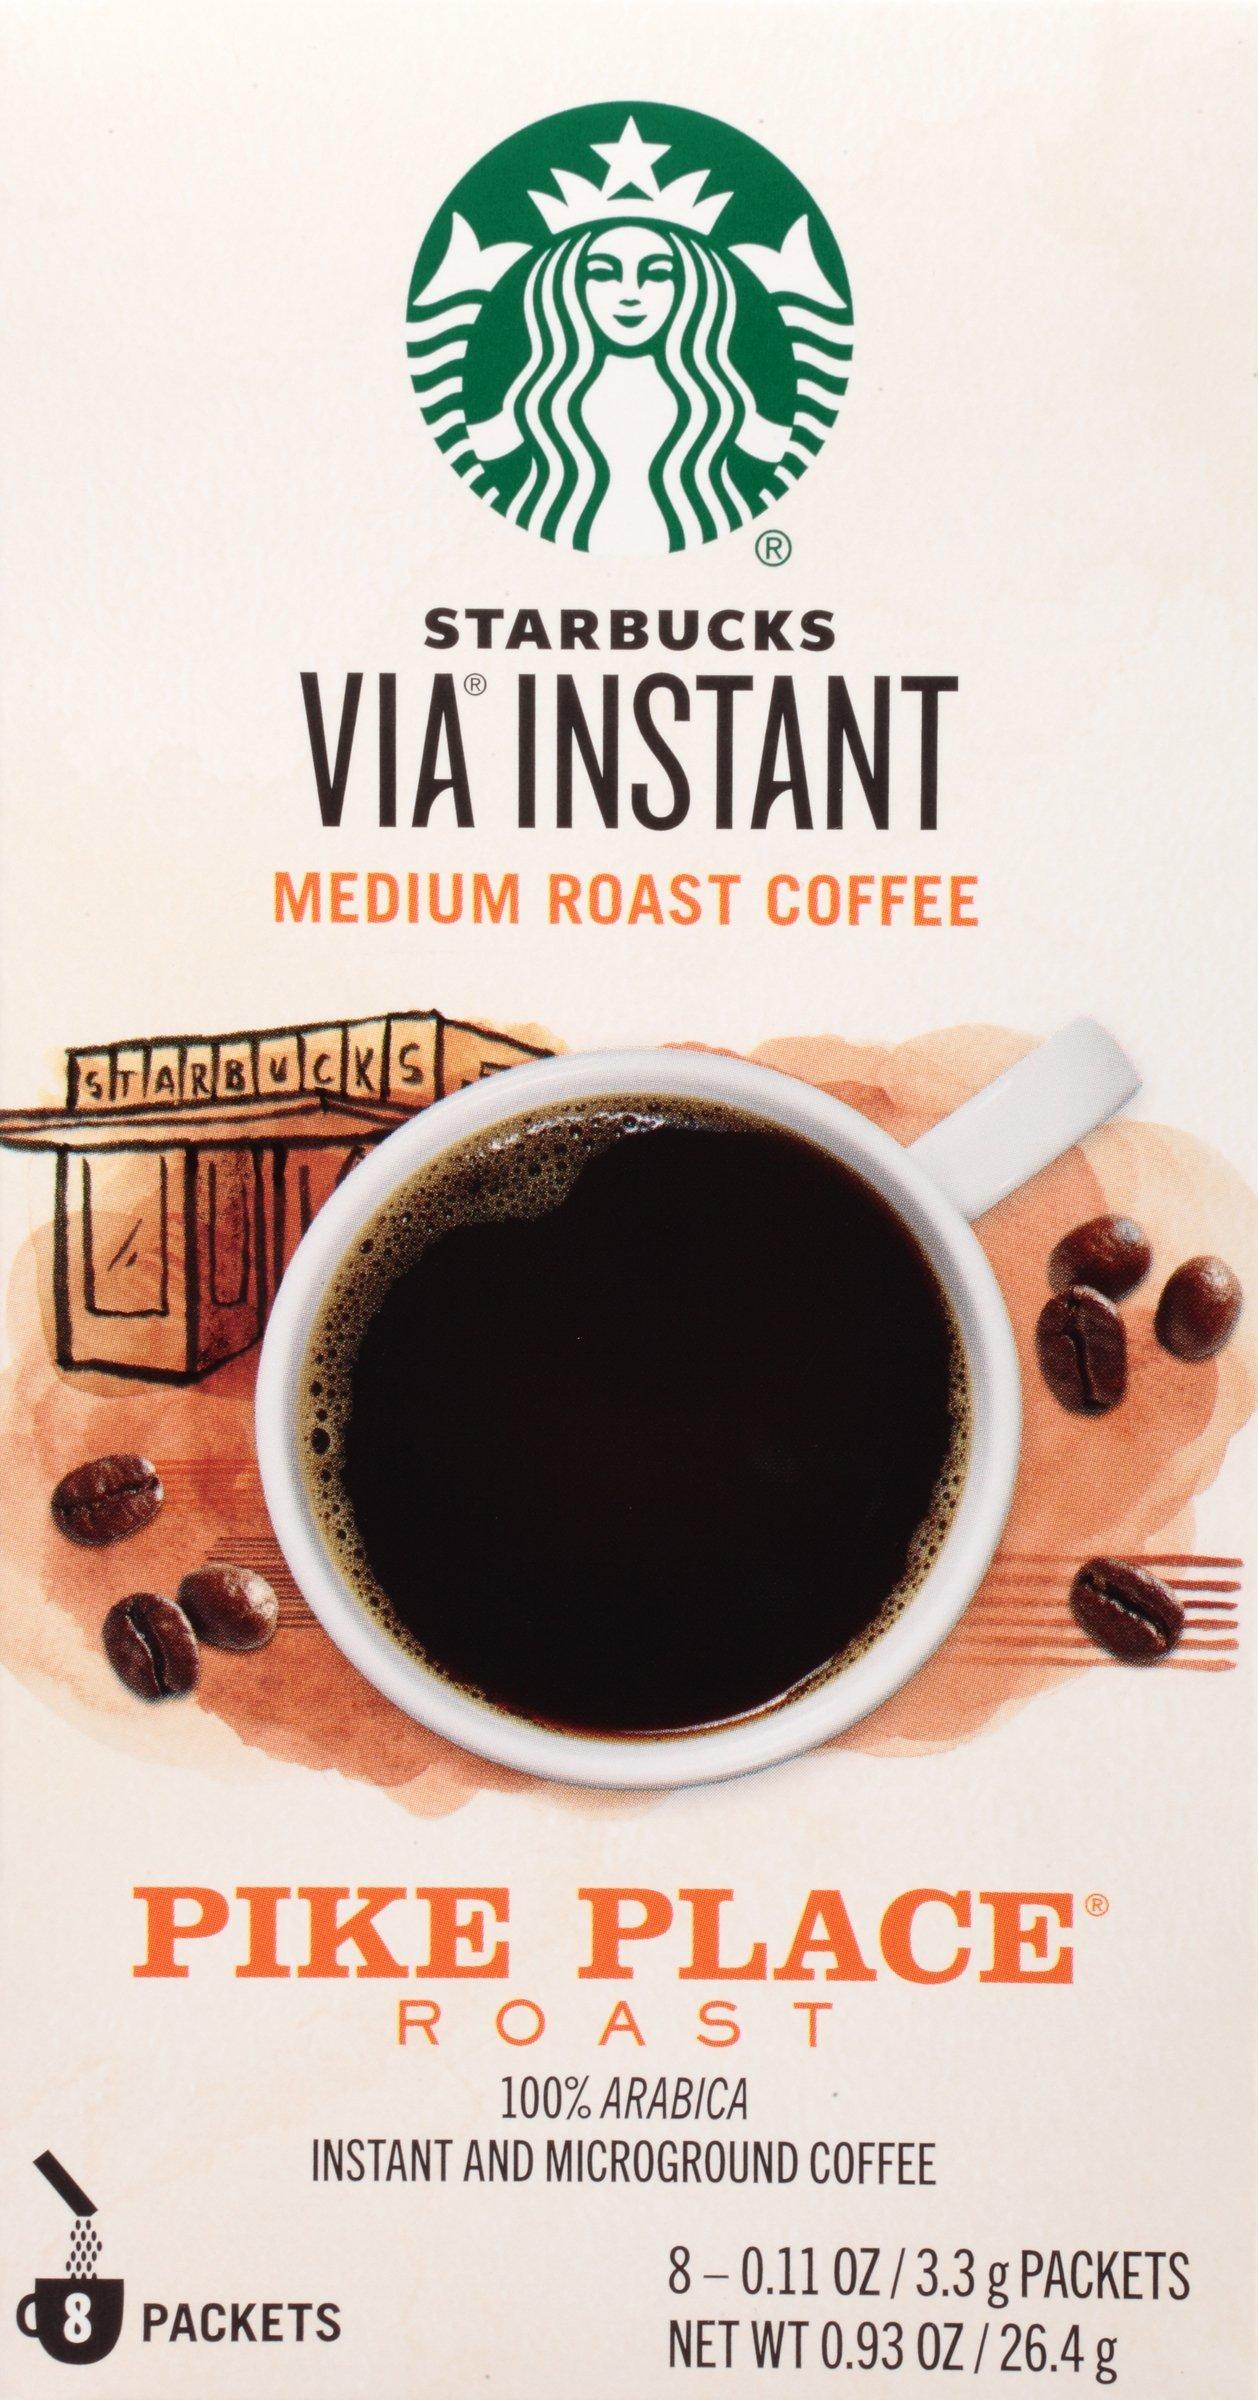 Starbucks VIA Instant Coffee, Pike Place Roast, 96 Count